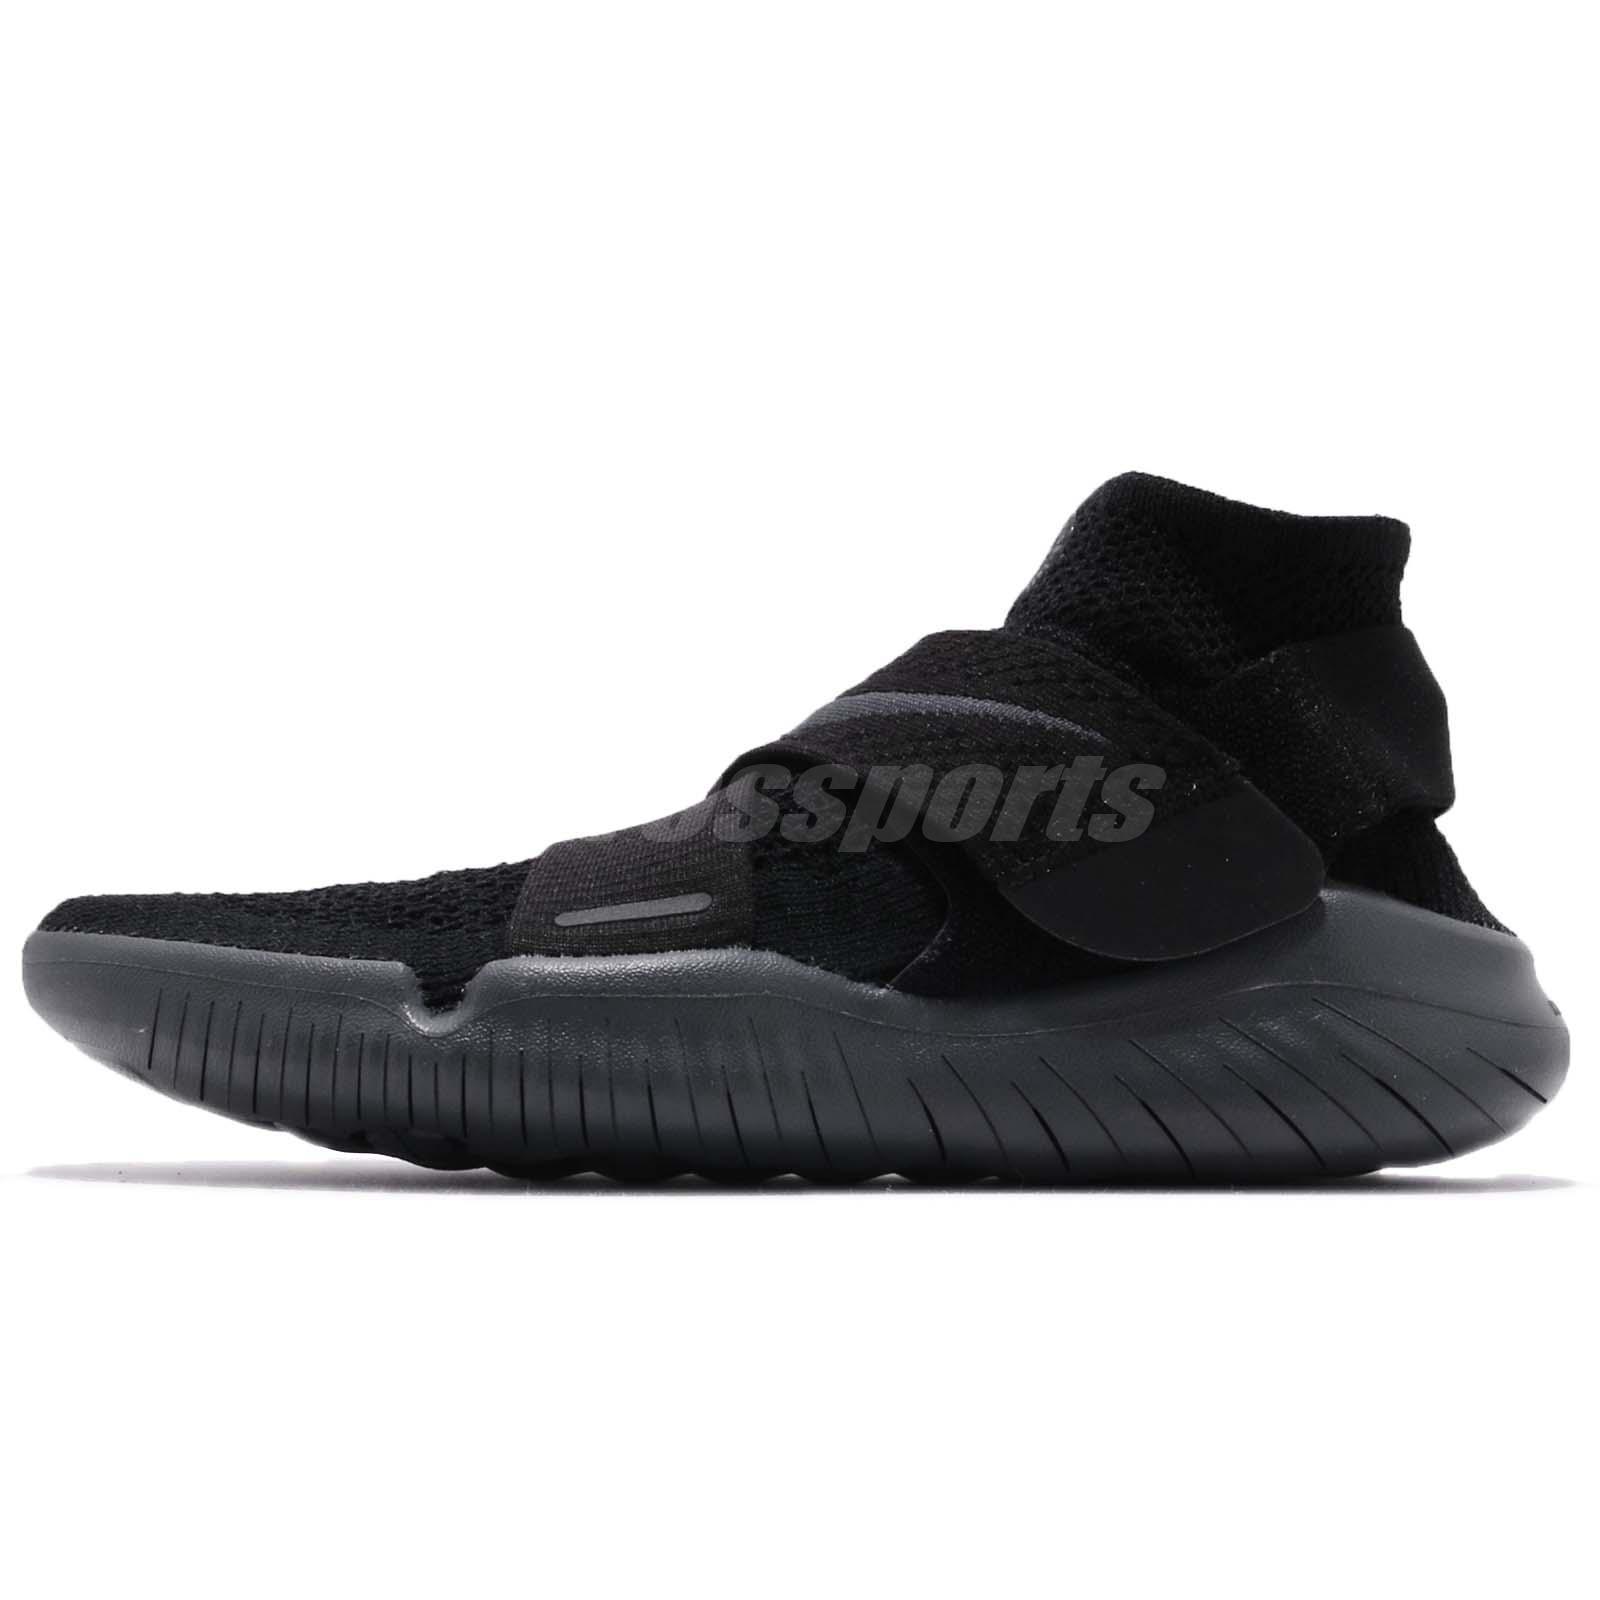 0a6fd78127b0 Nike Wmns Free RN Motion FK 2018 Flyknit Black Women Running Shoes 942841- 002